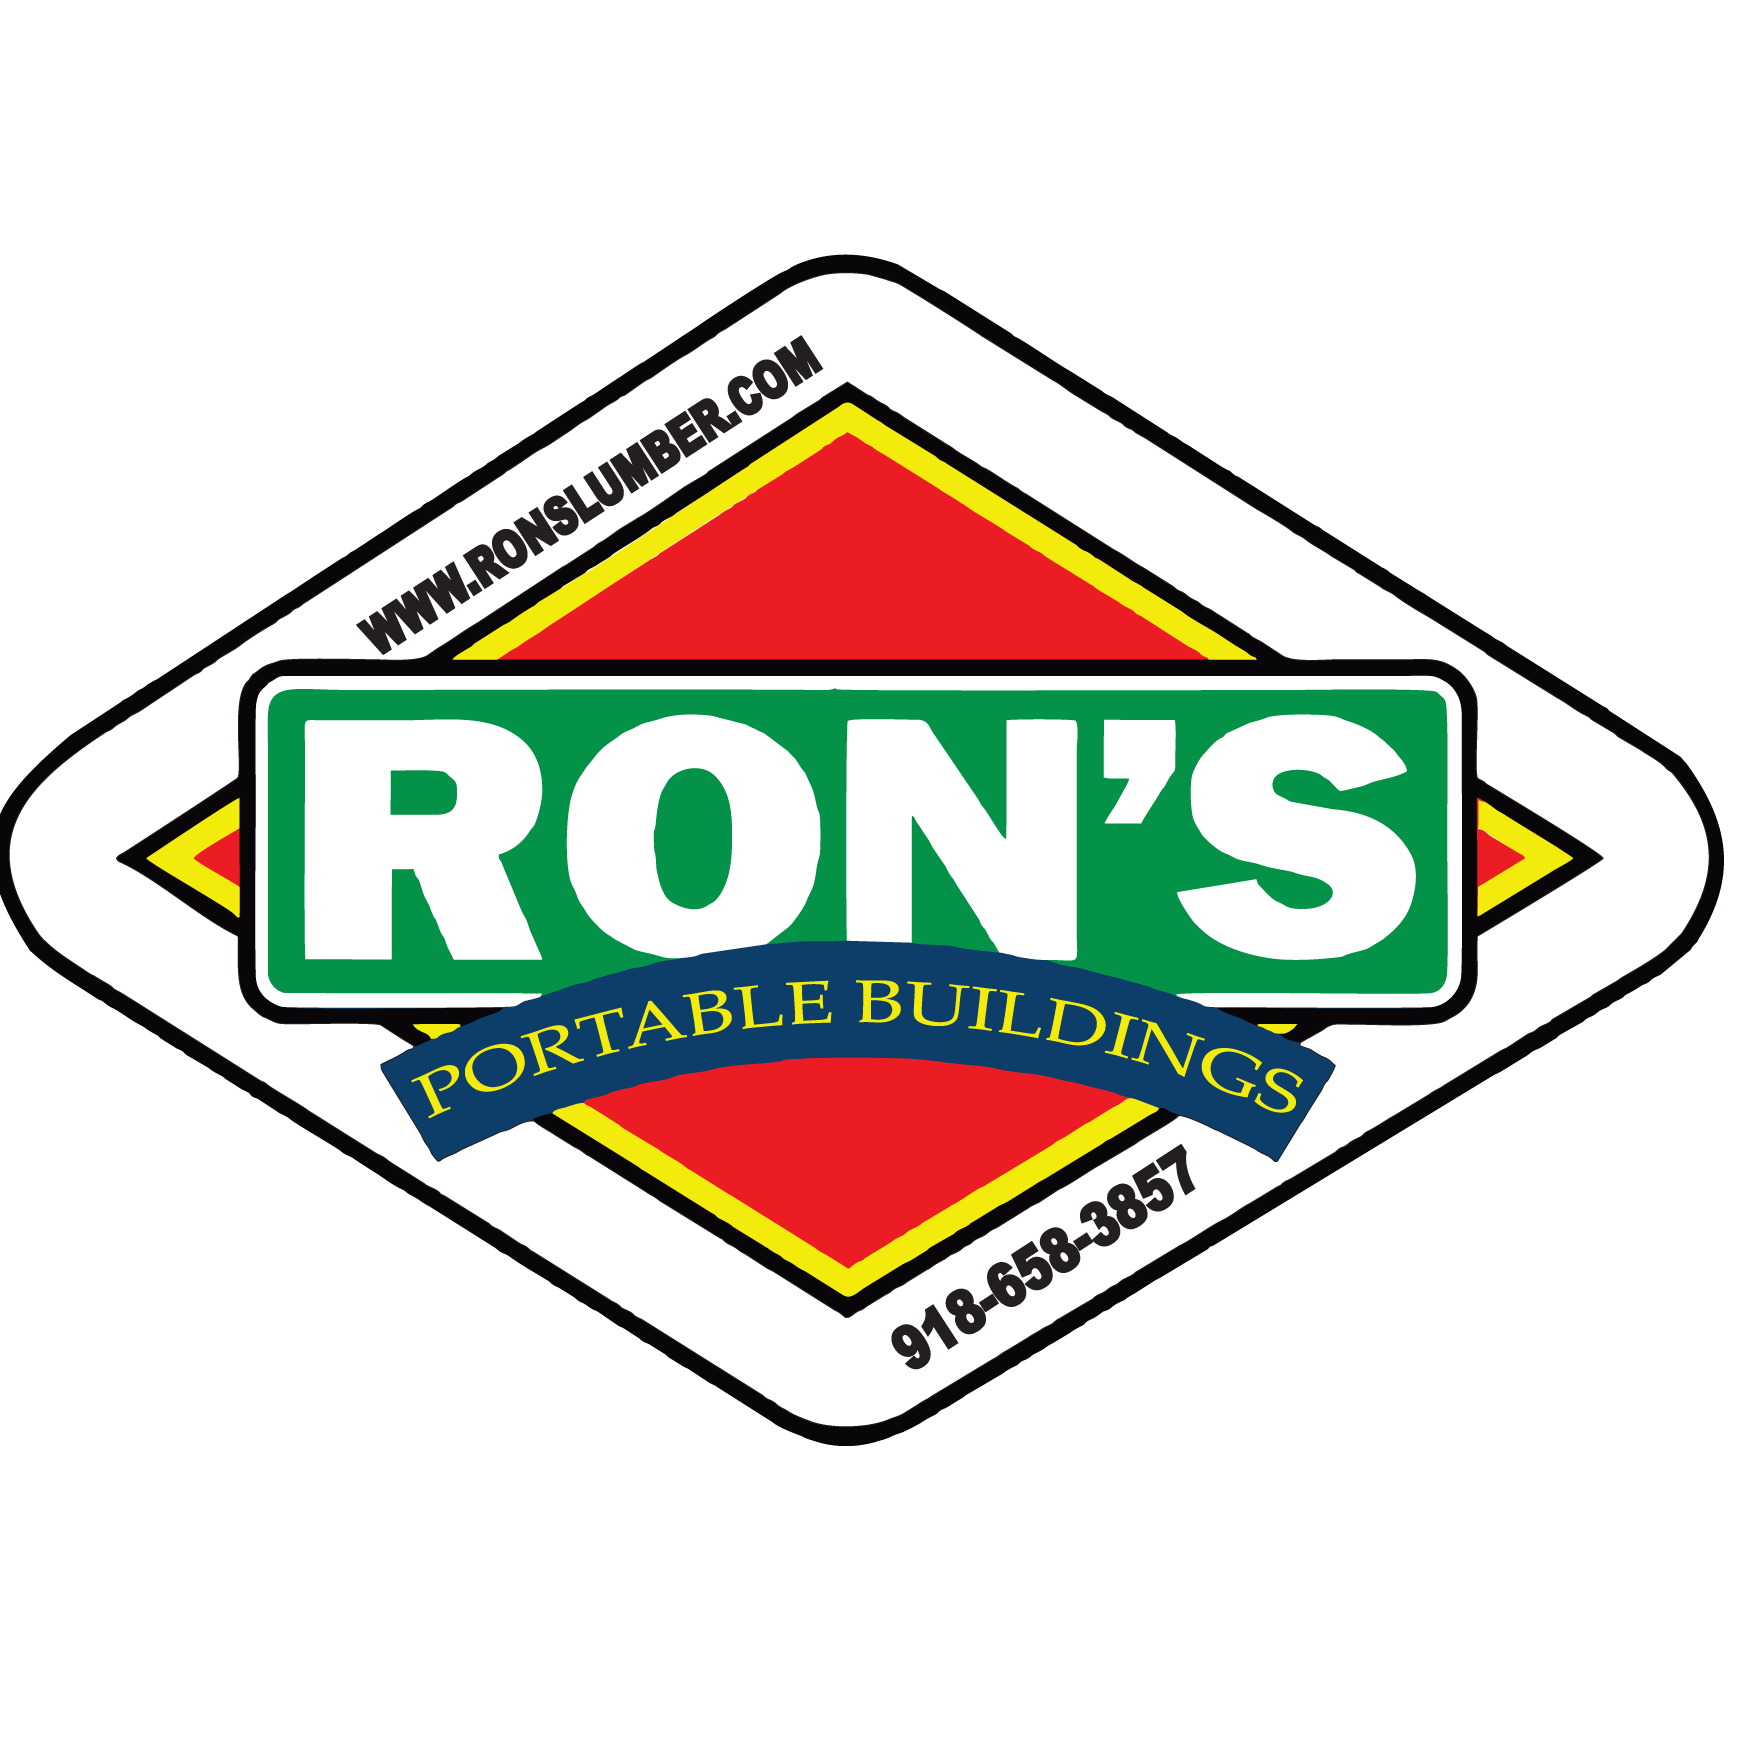 Ron's Portable Buildings 37850 US Hwy 59 Howe, OK Building ...